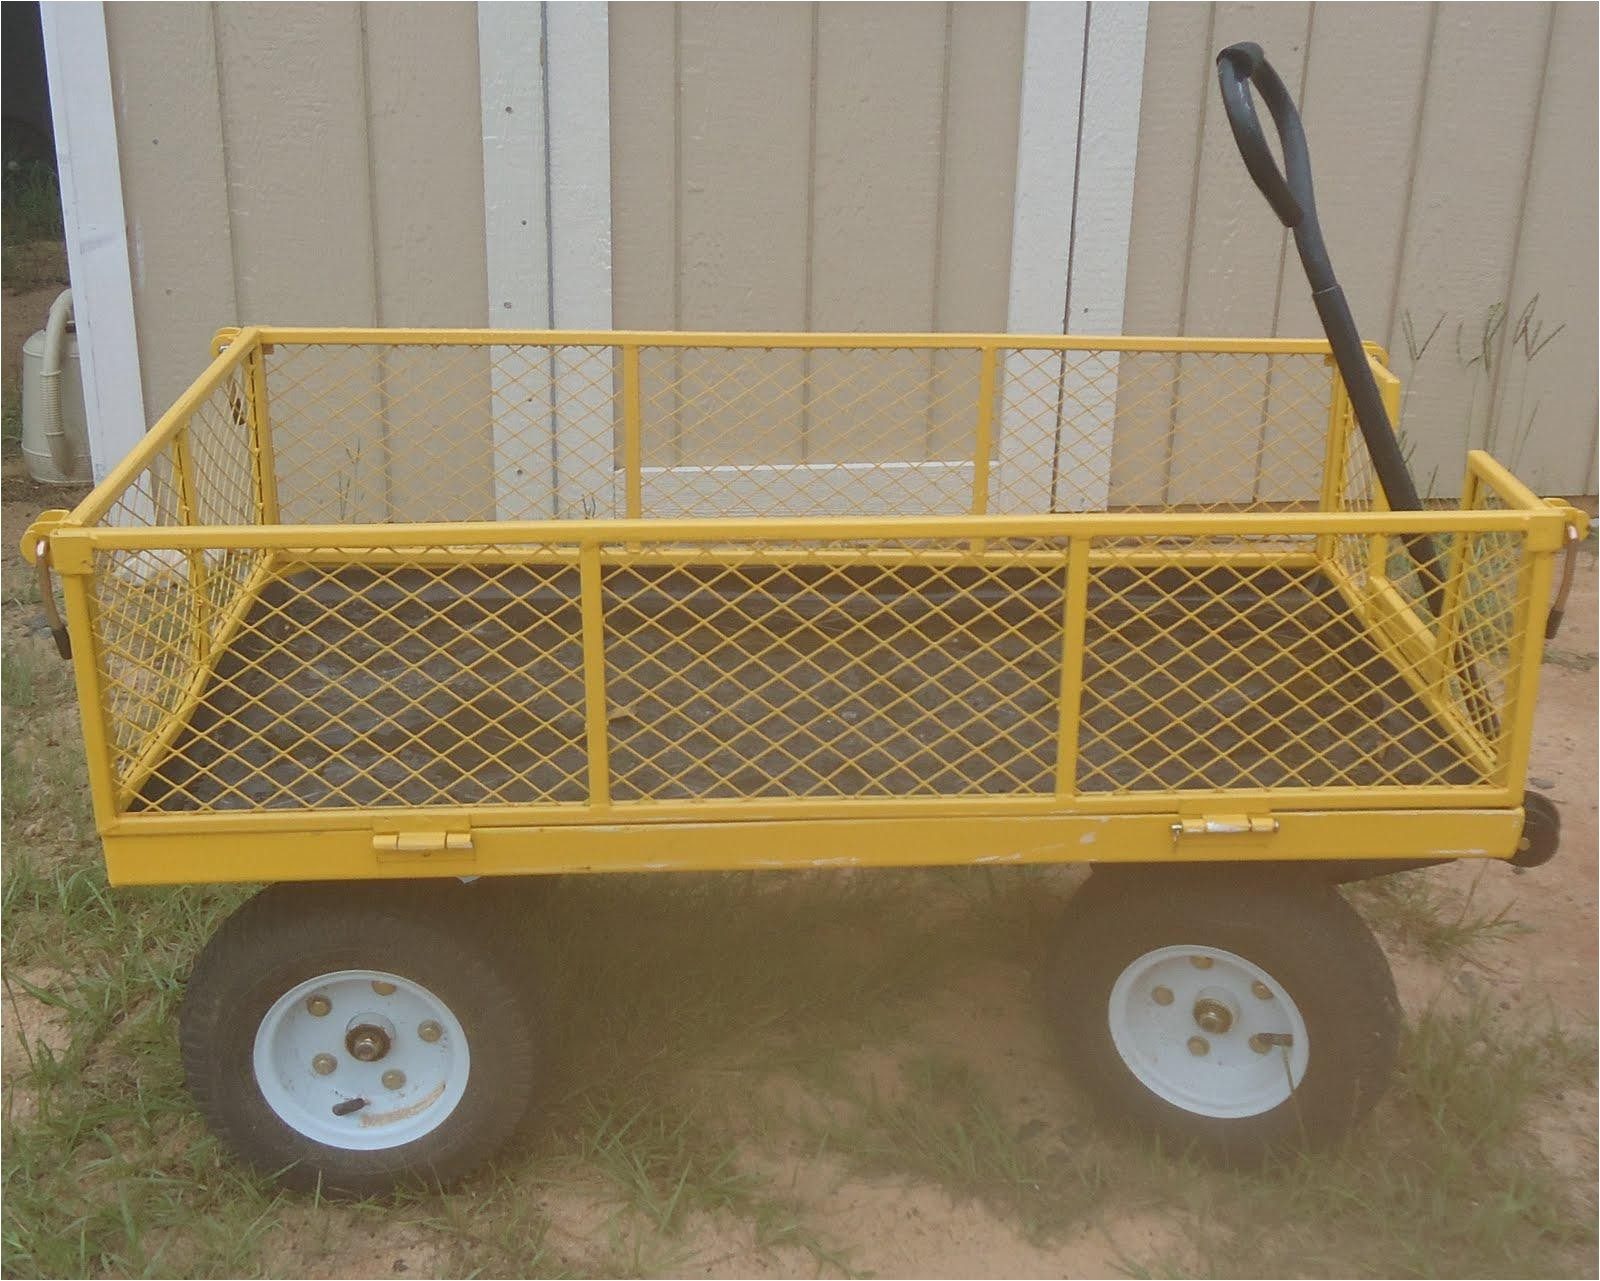 Tractor Supply Garden Cart Best Garden Carts Ideas Design Idea and ...